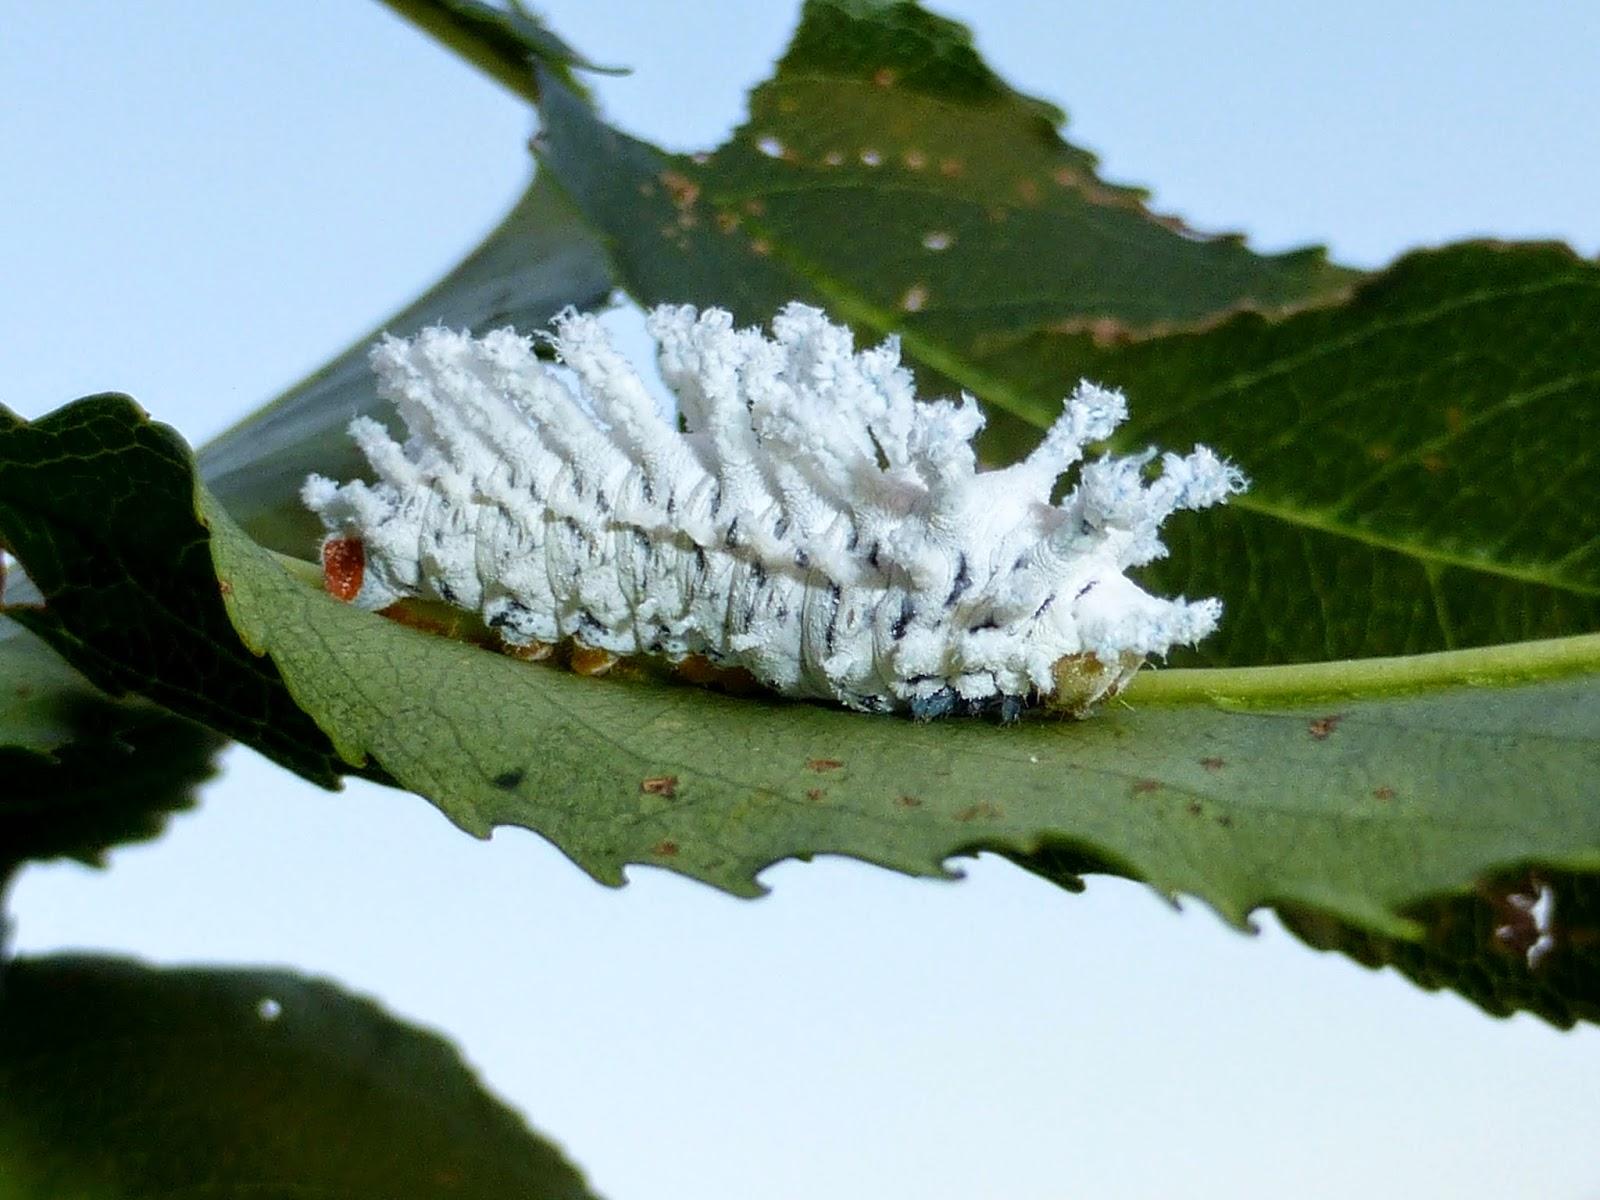 Archaeoattacus edwardsii caterpillar